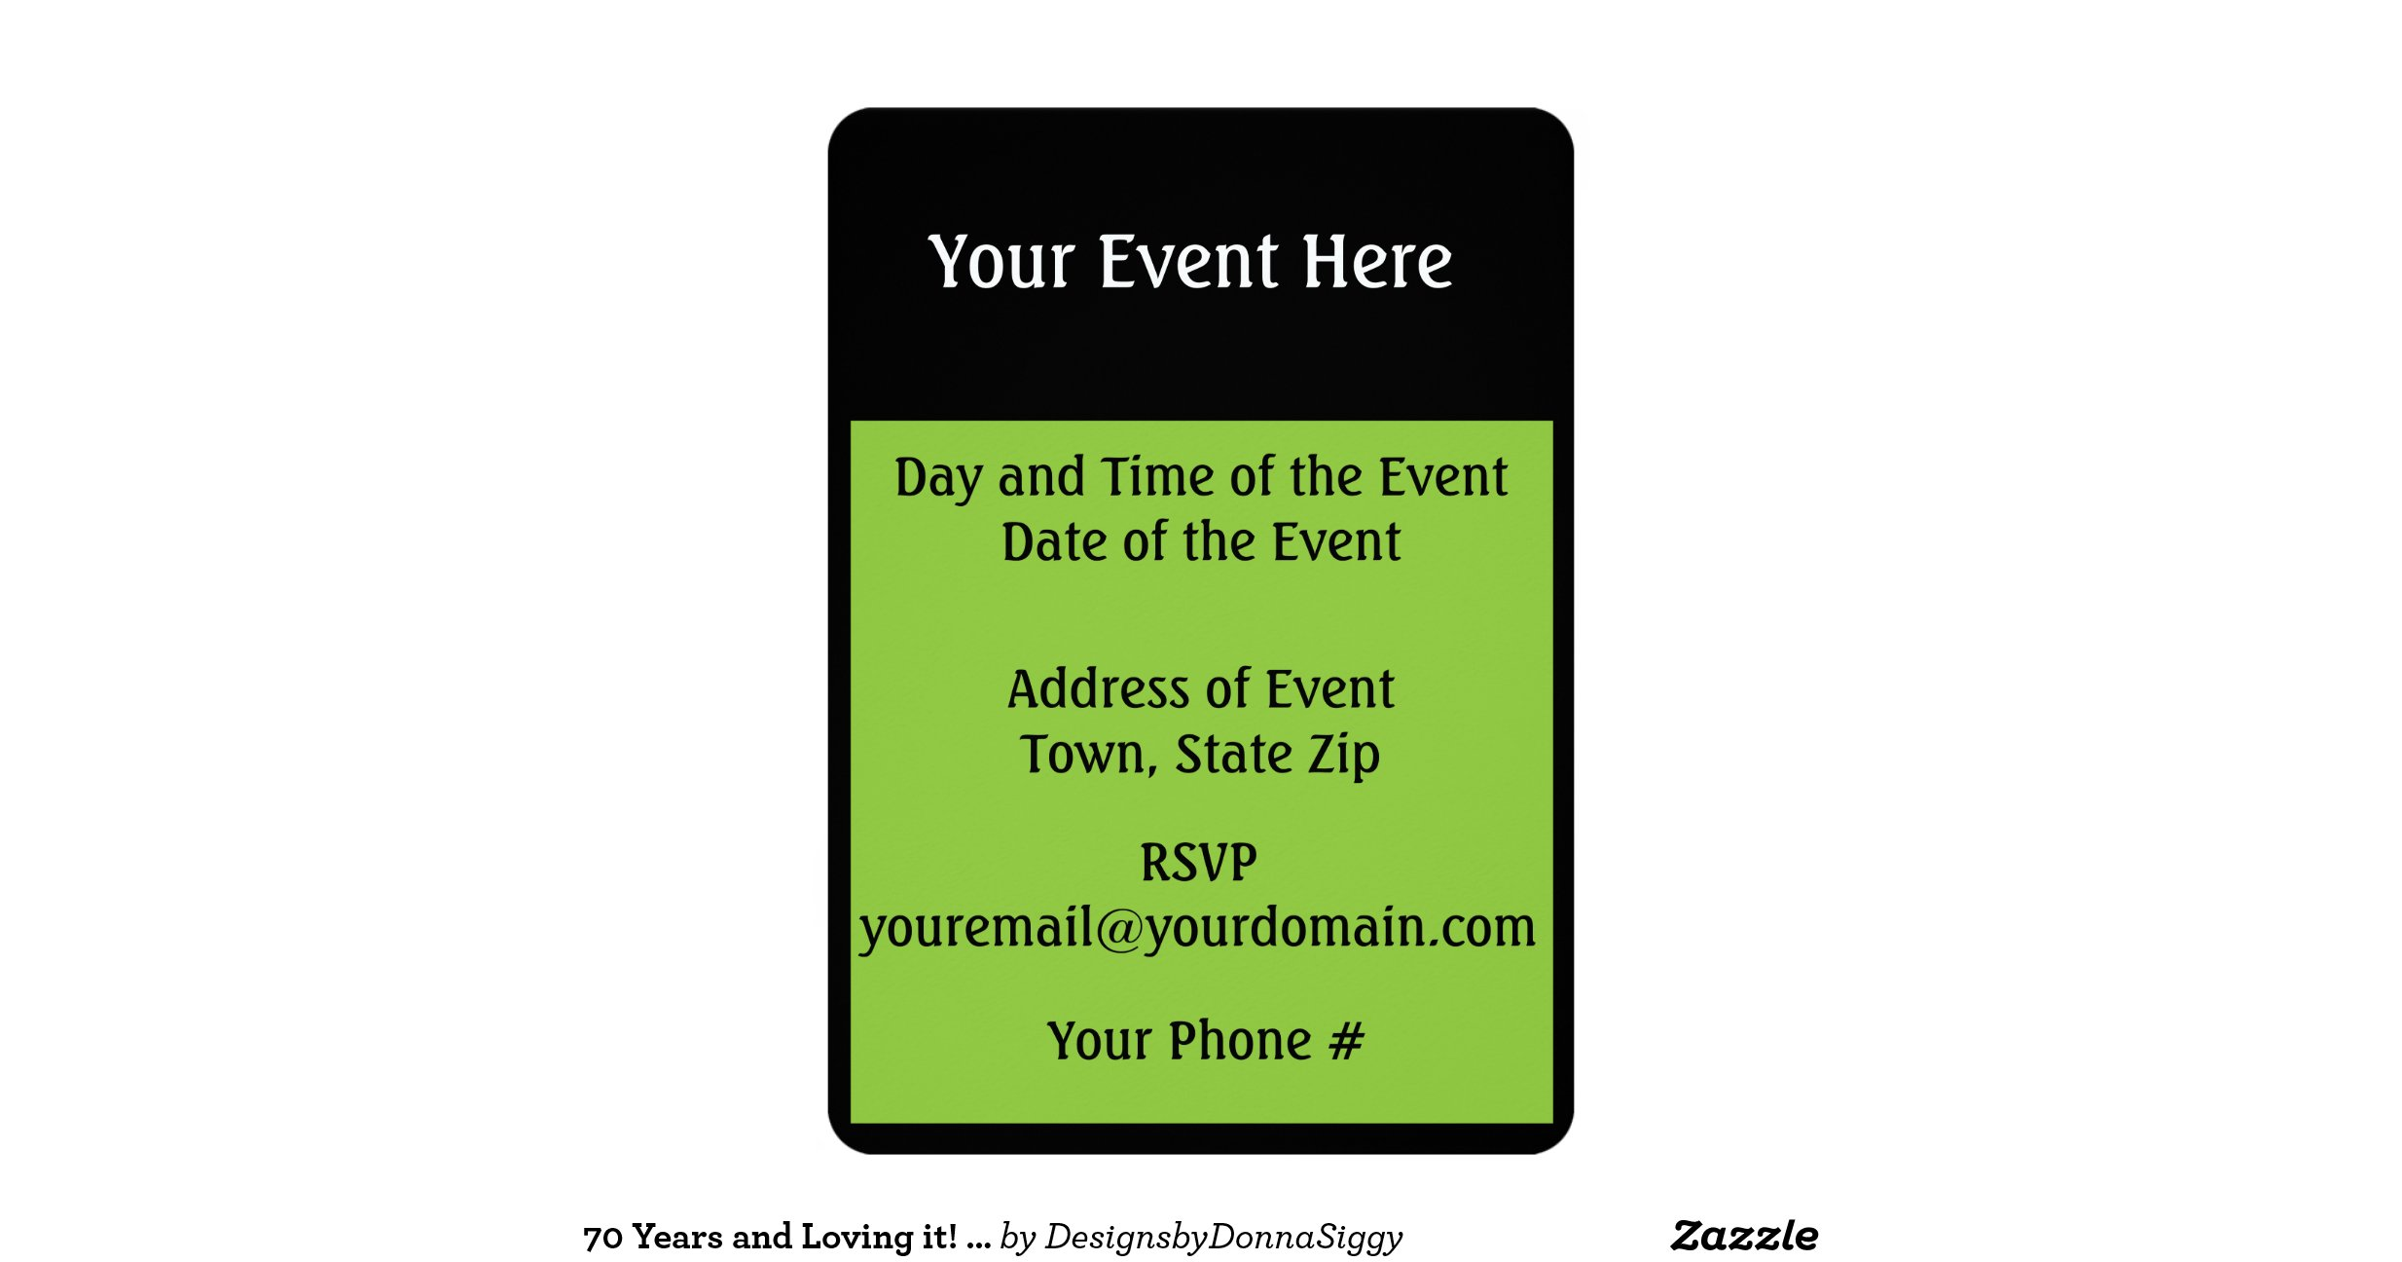 70 years and loving it 5 x 7 invitation card zazzle for Home landscape design premium 17 5